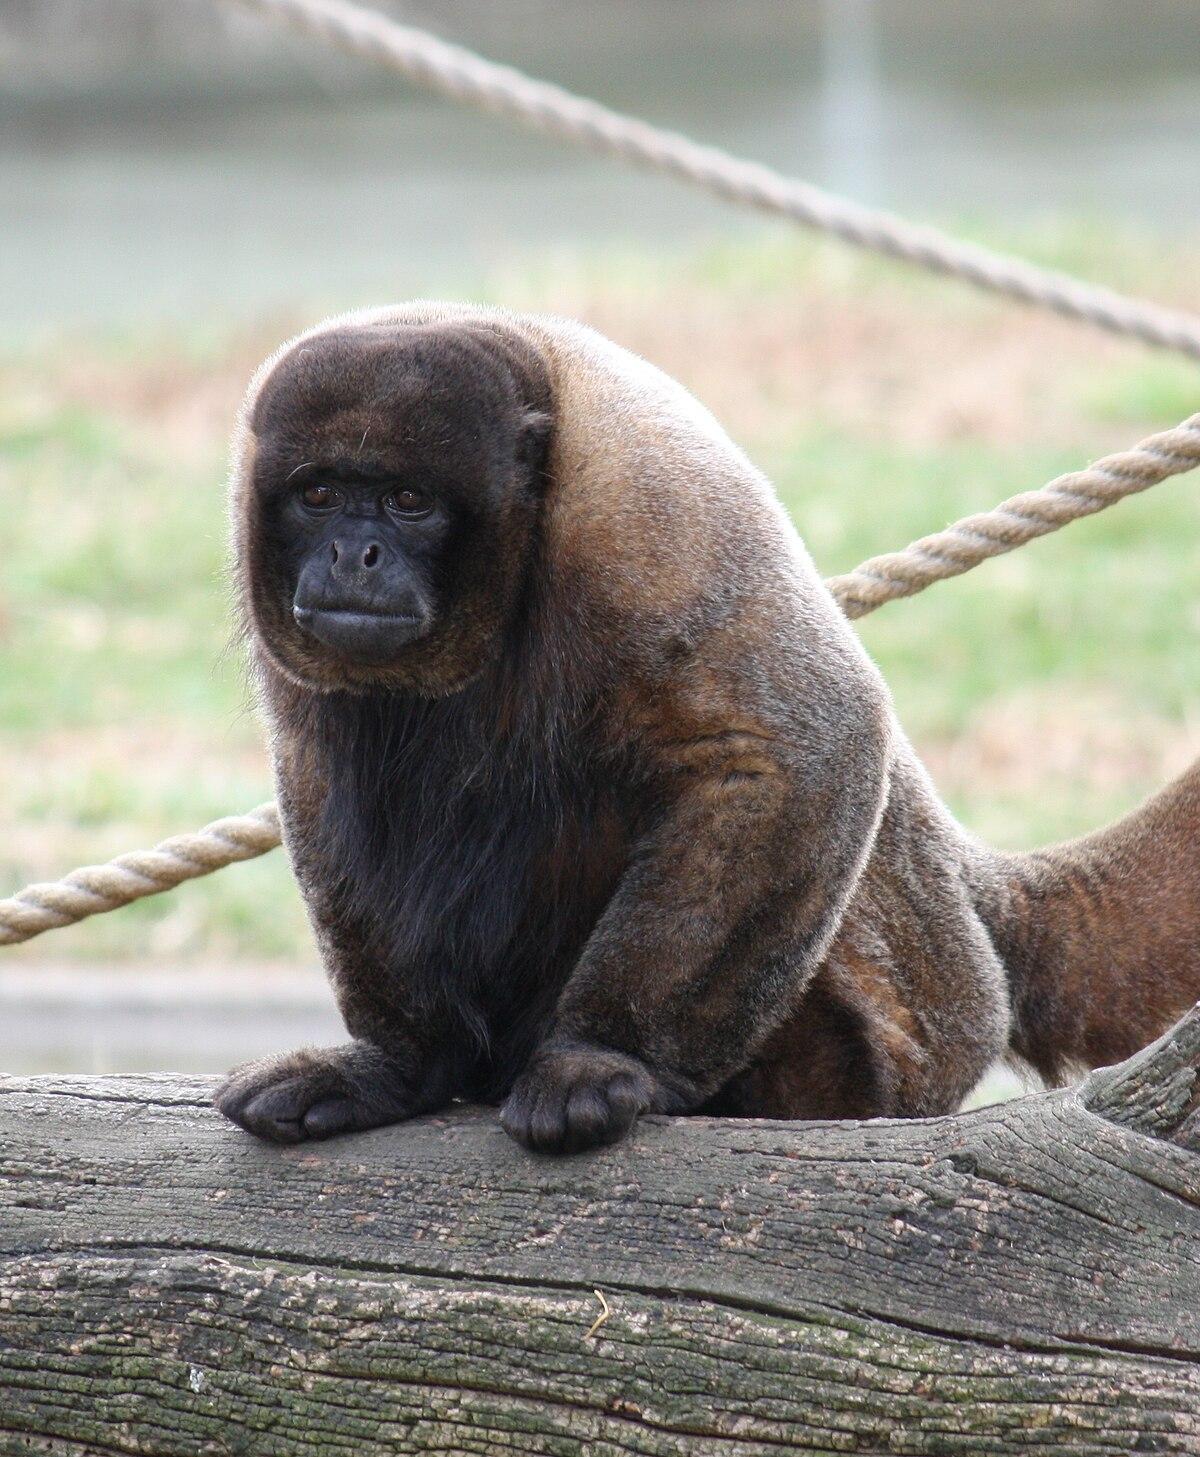 What Kind Of Food Do Monkeys Eat